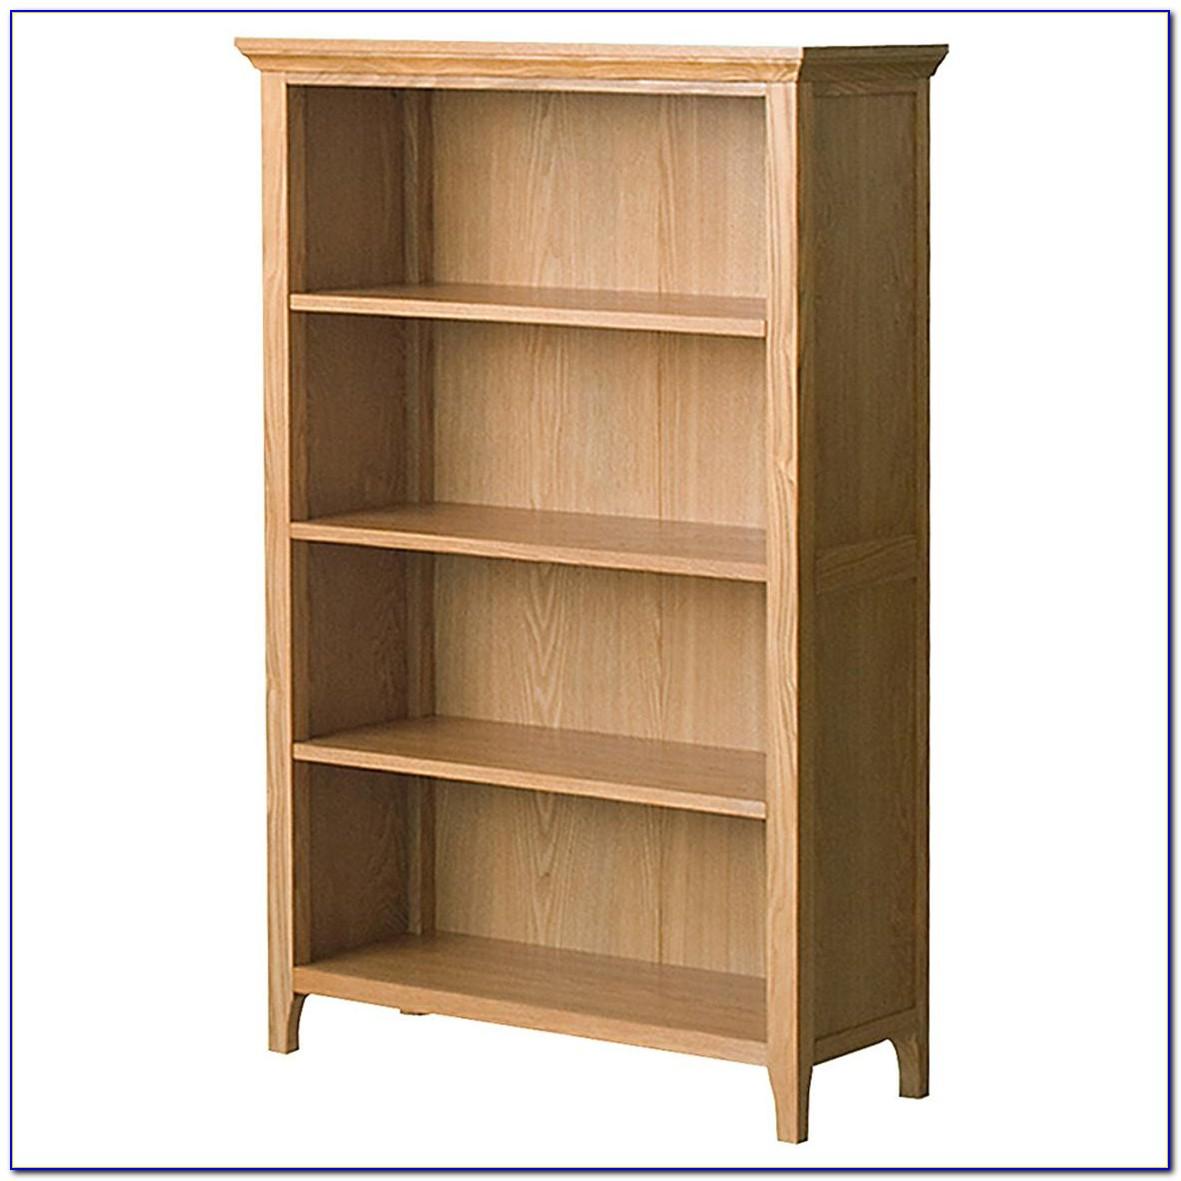 Oak Wooden Bookcases